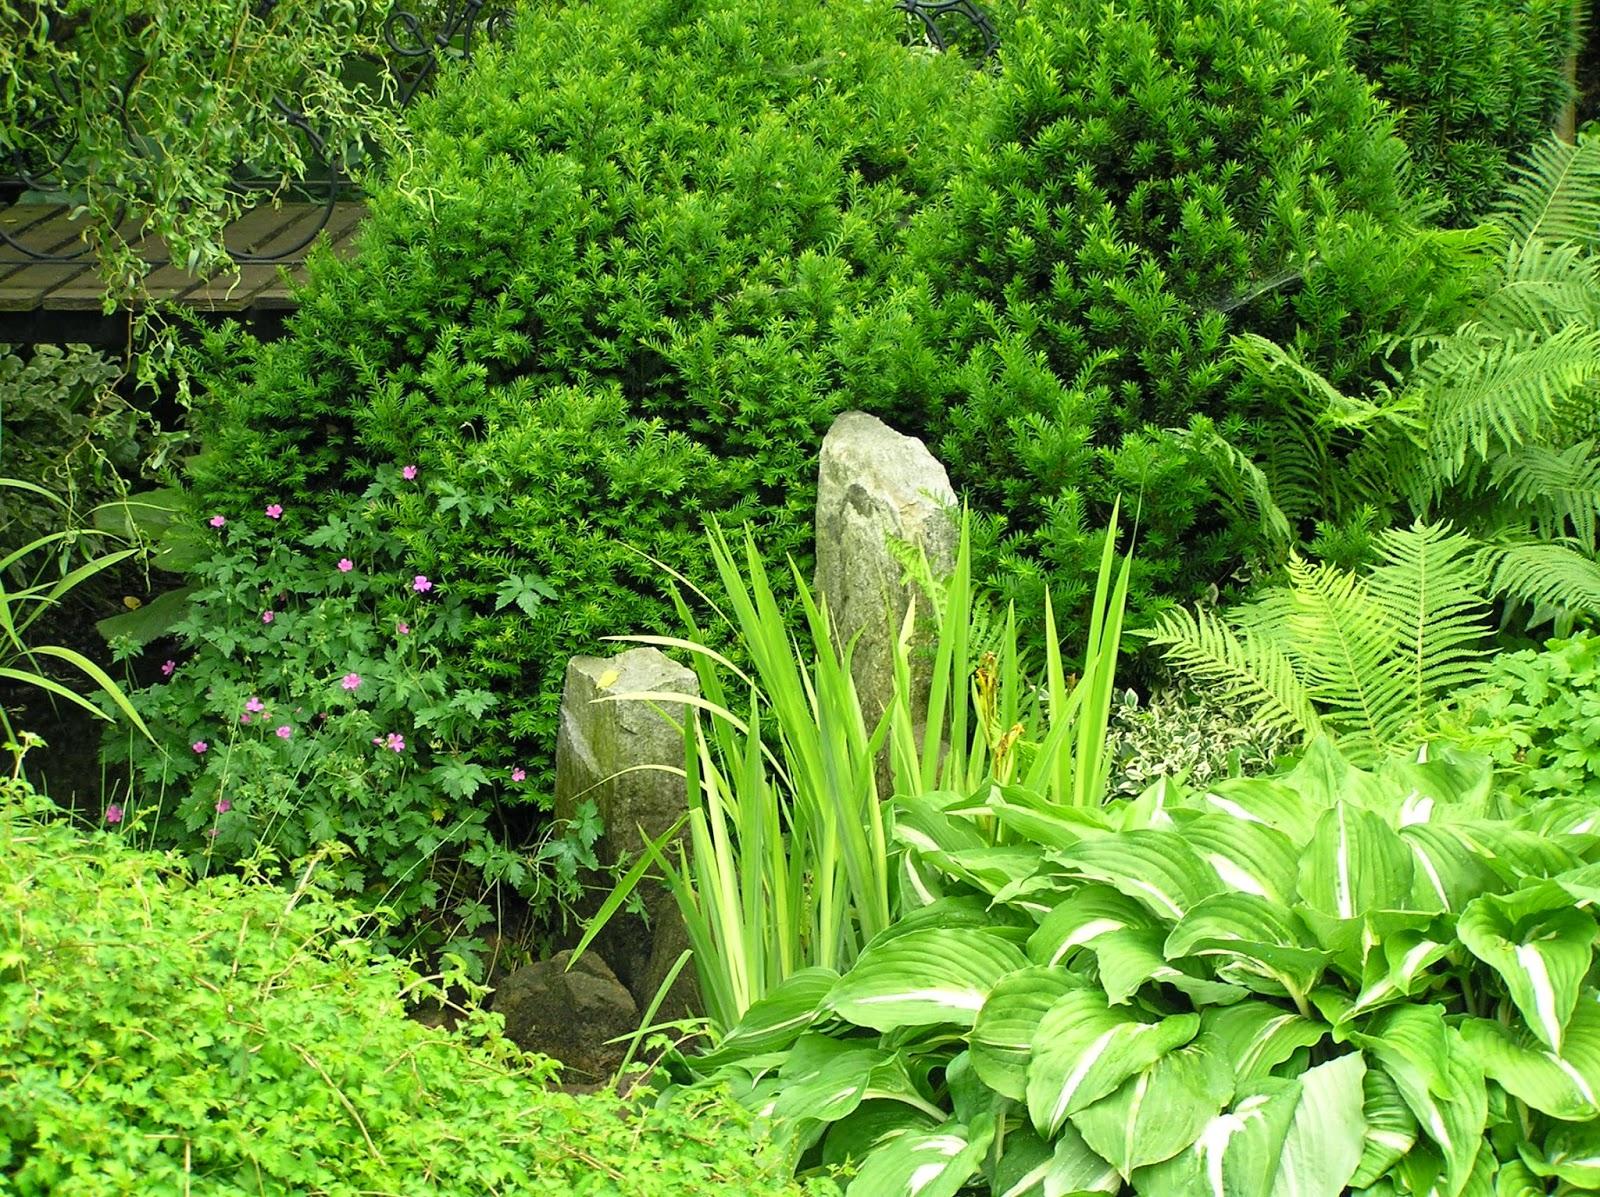 rośliny nad strumieniem